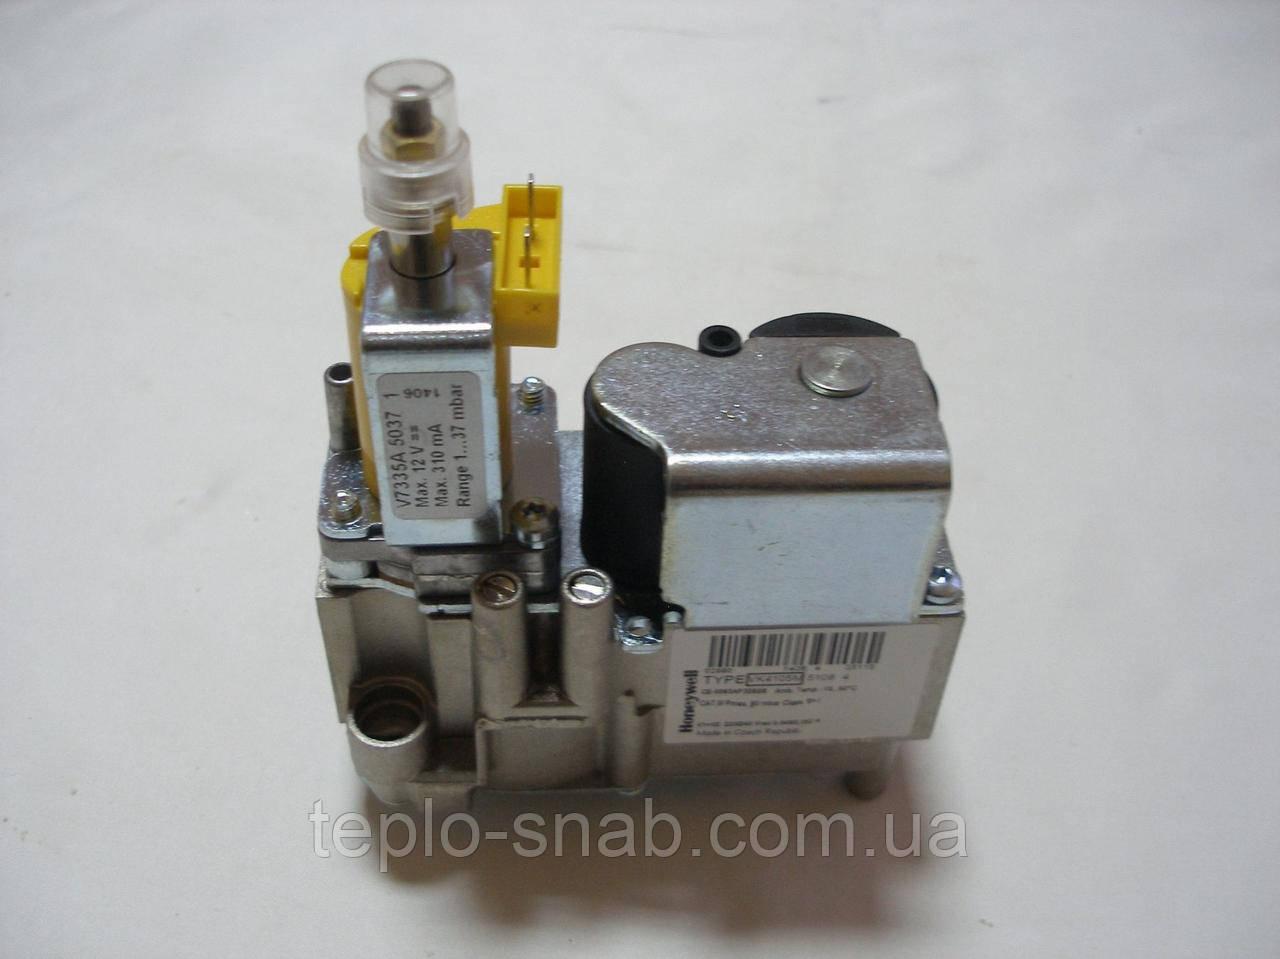 "Газовый клапан Honeywell VK 4105M M-M 3/4"". Westen Quasar D 24 F"